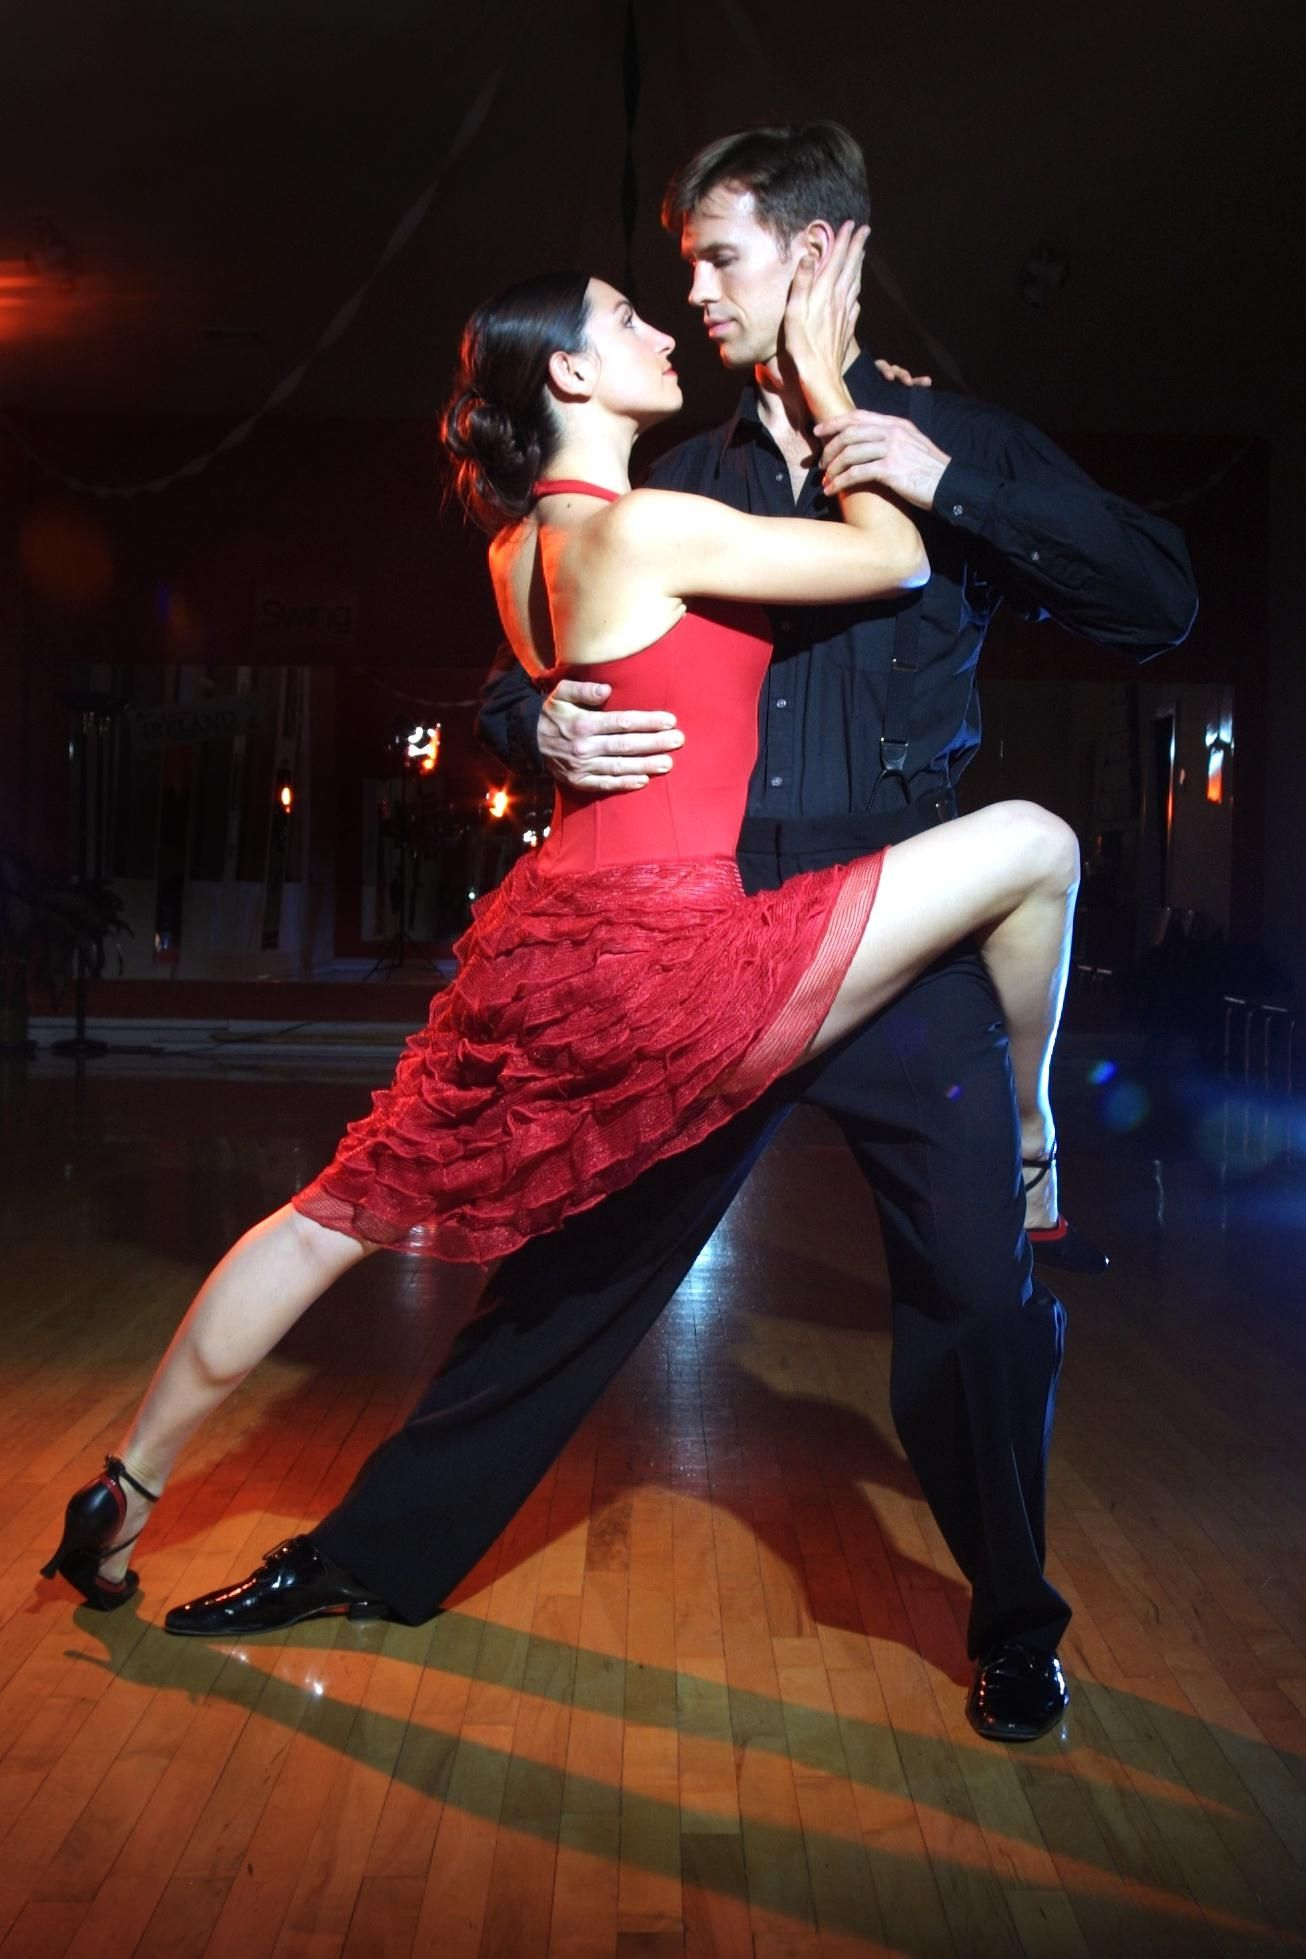 Http Dolcevita Gr Wp Content Uploads 2013 03 Latin Xoros Jpg Tango Dancers Flamenco Dancers Tango Dance